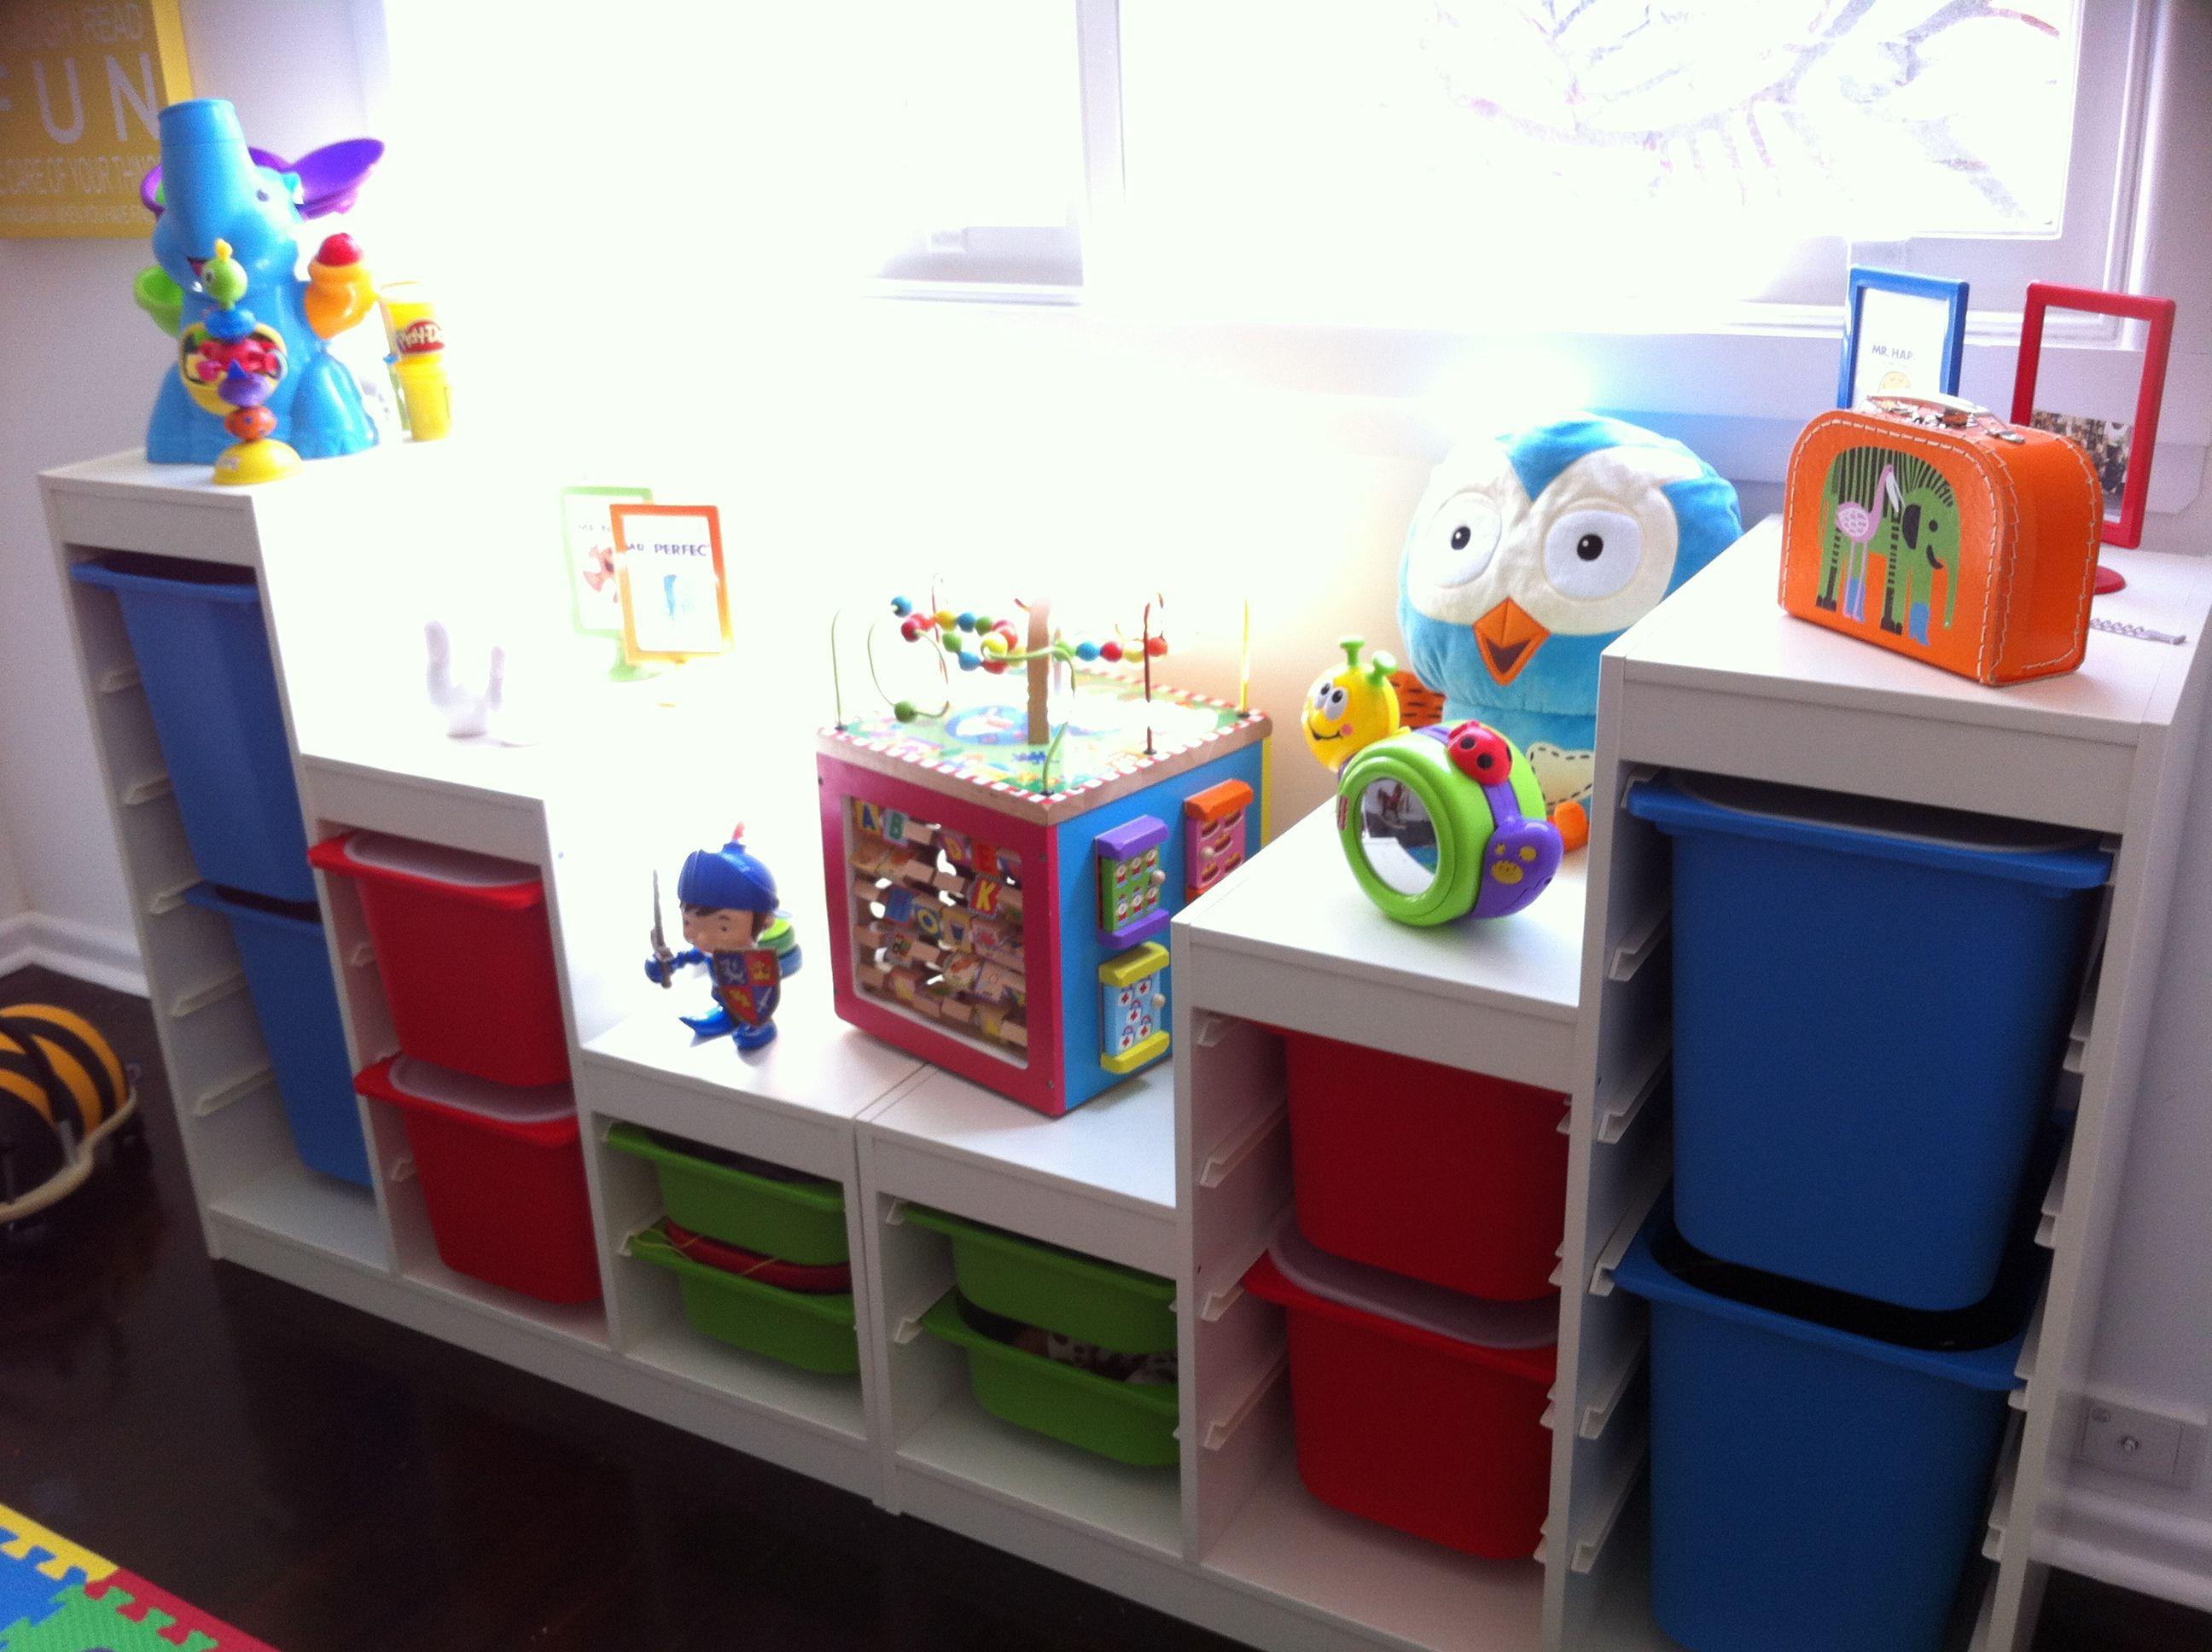 ikea trofast storage solutions astuces ikea pinterest salle de jeux ikea et rangement. Black Bedroom Furniture Sets. Home Design Ideas